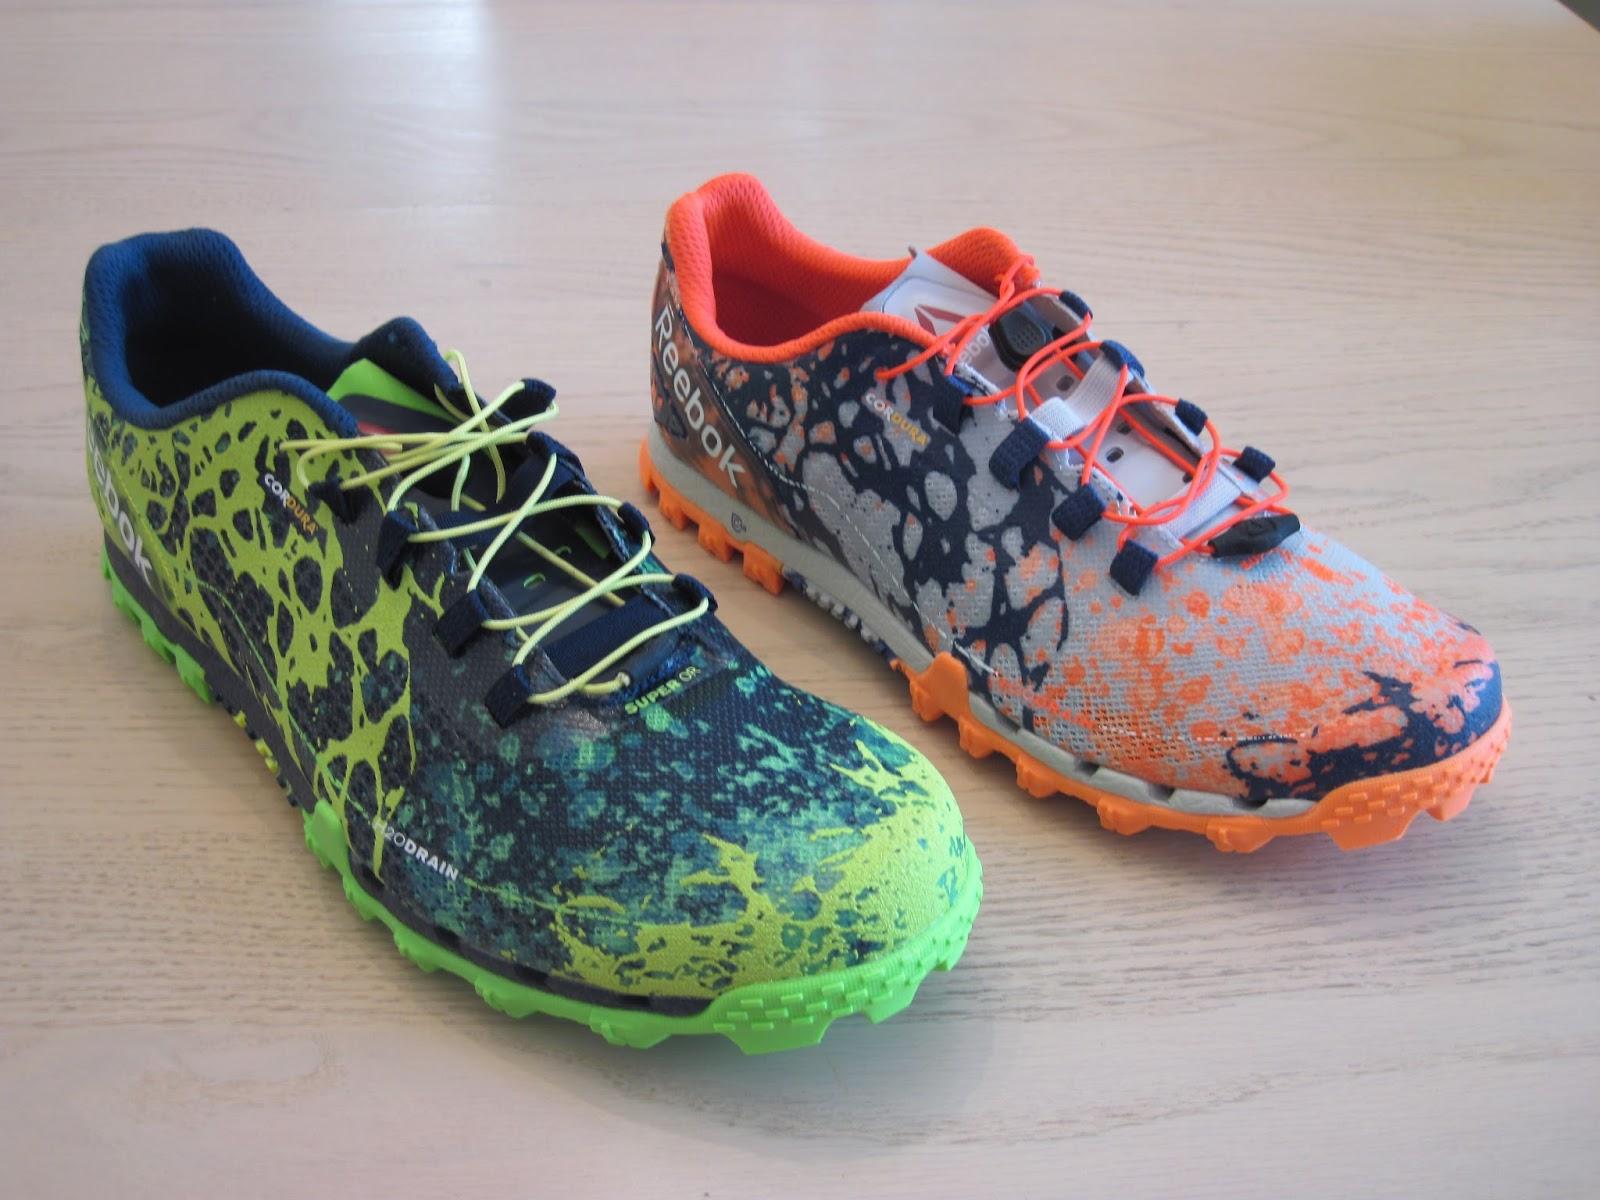 d3172e8b195a4c The MUDMAN Report  GEAR REVIEW  Reebok All-Terrain shoes - Super OR ...